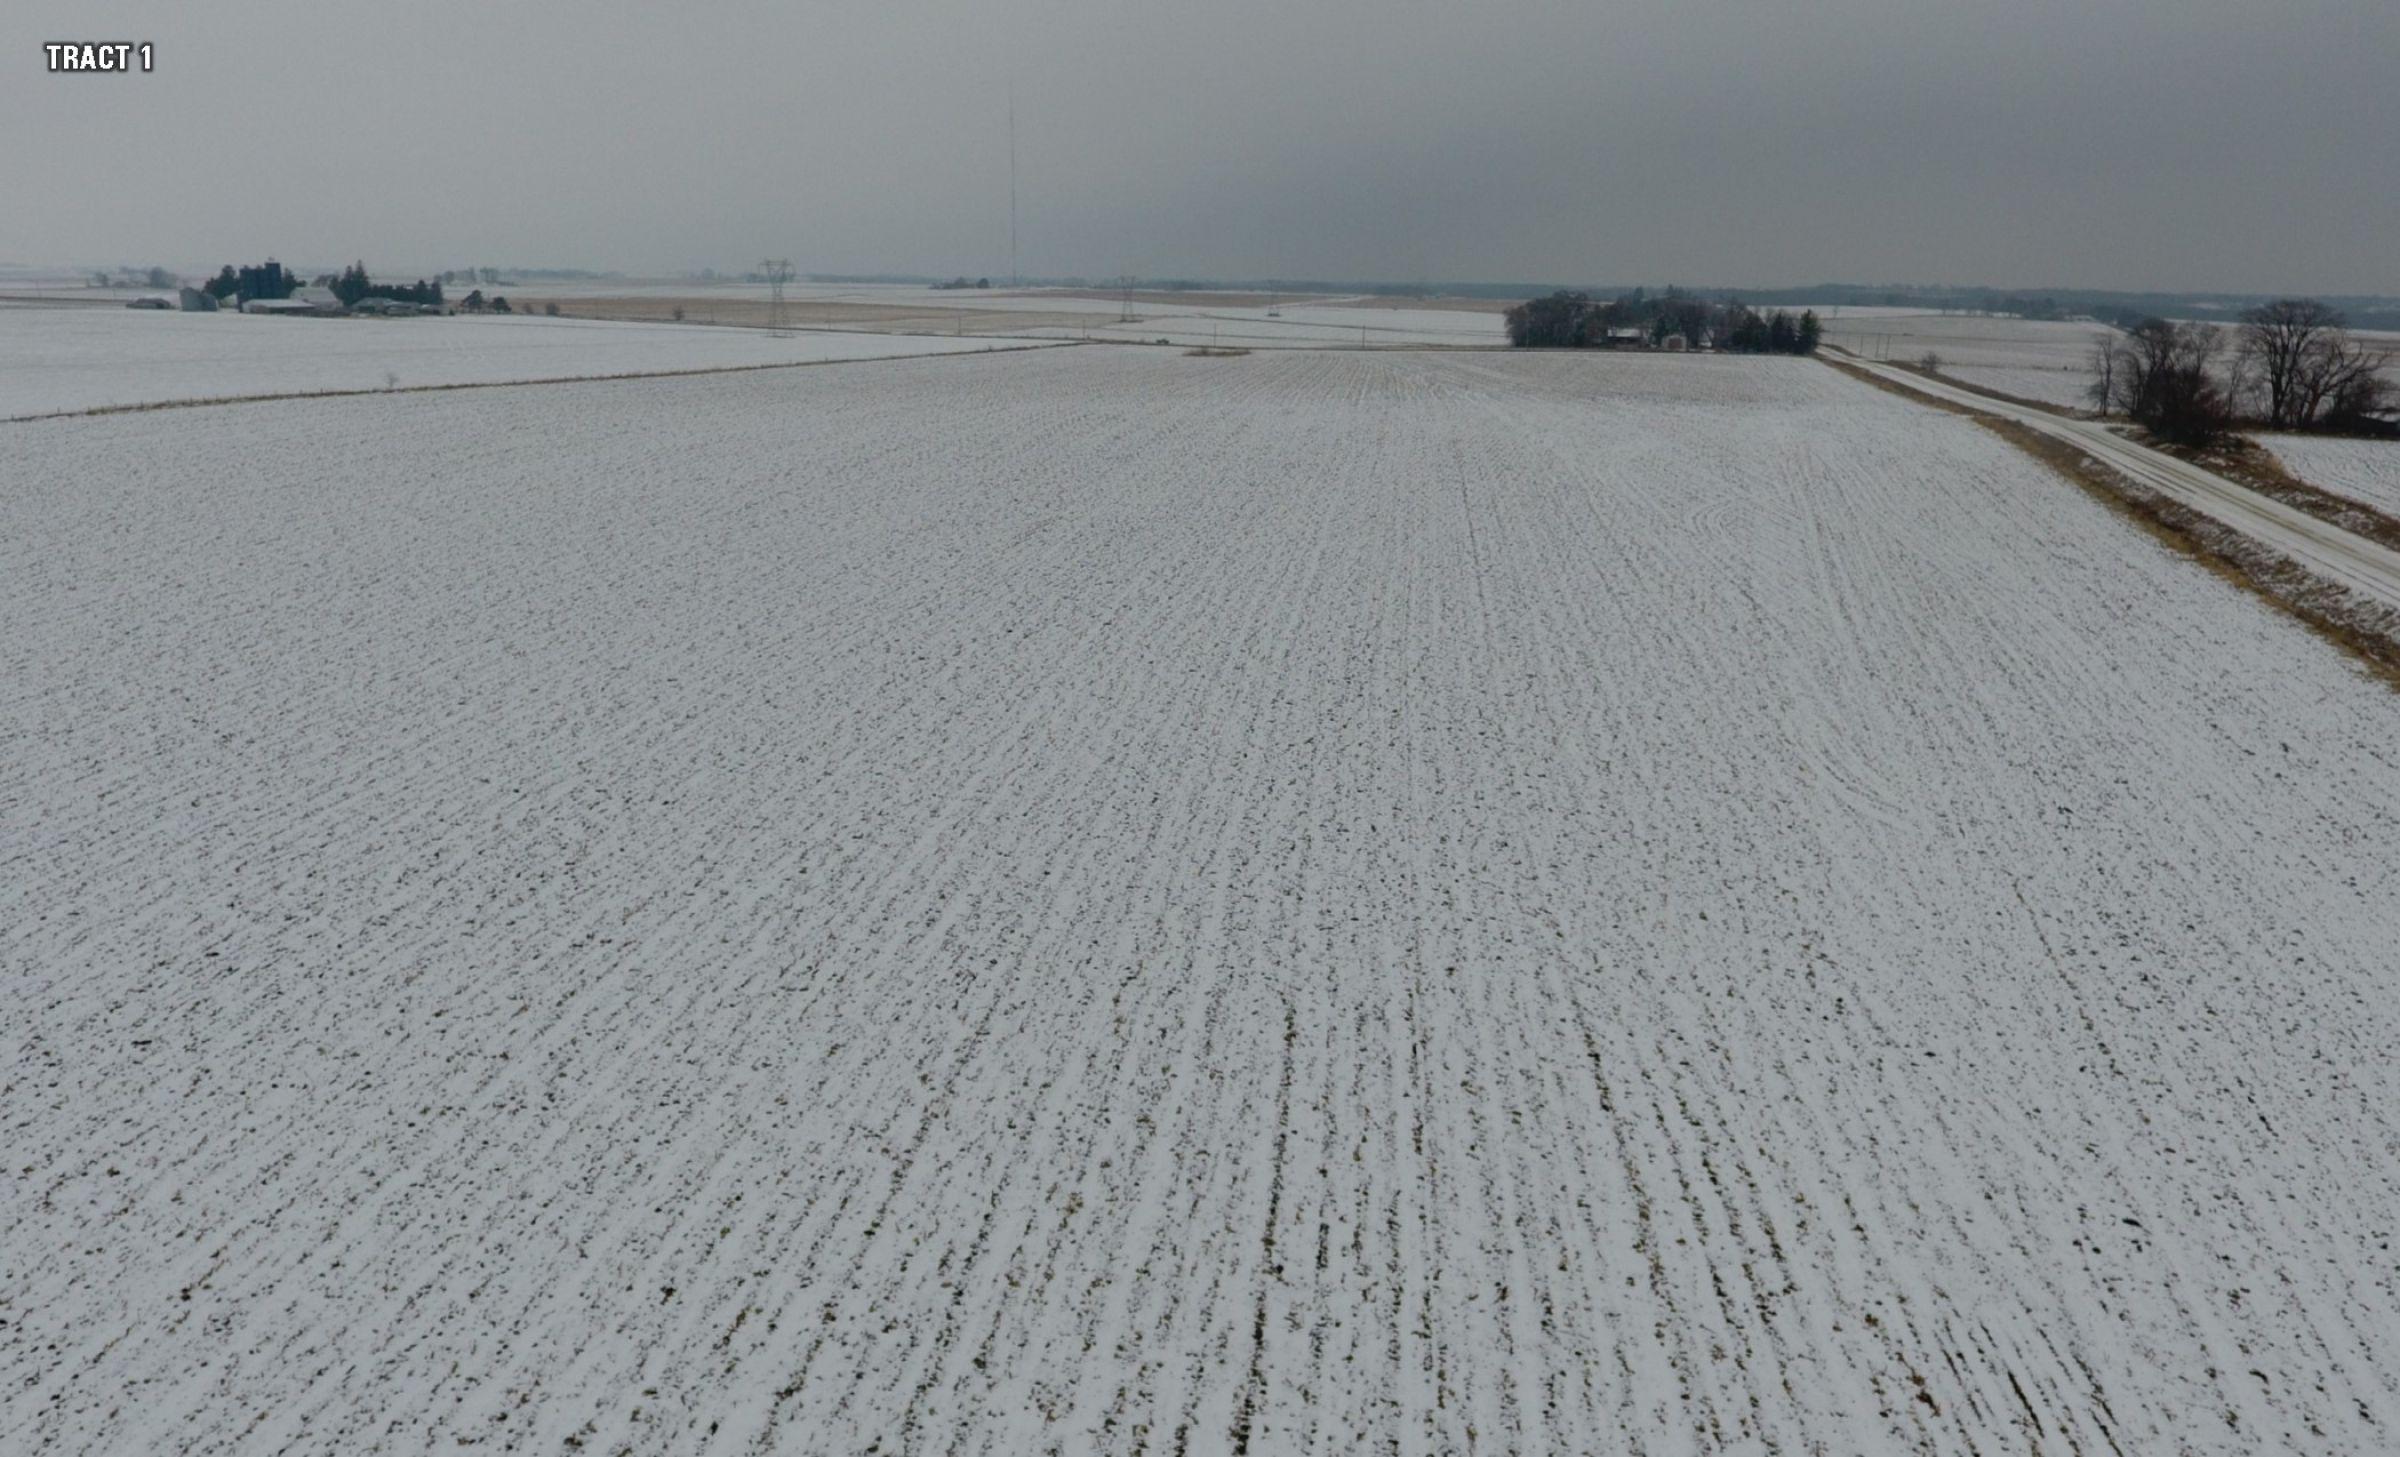 Aerial Photo - Looking North